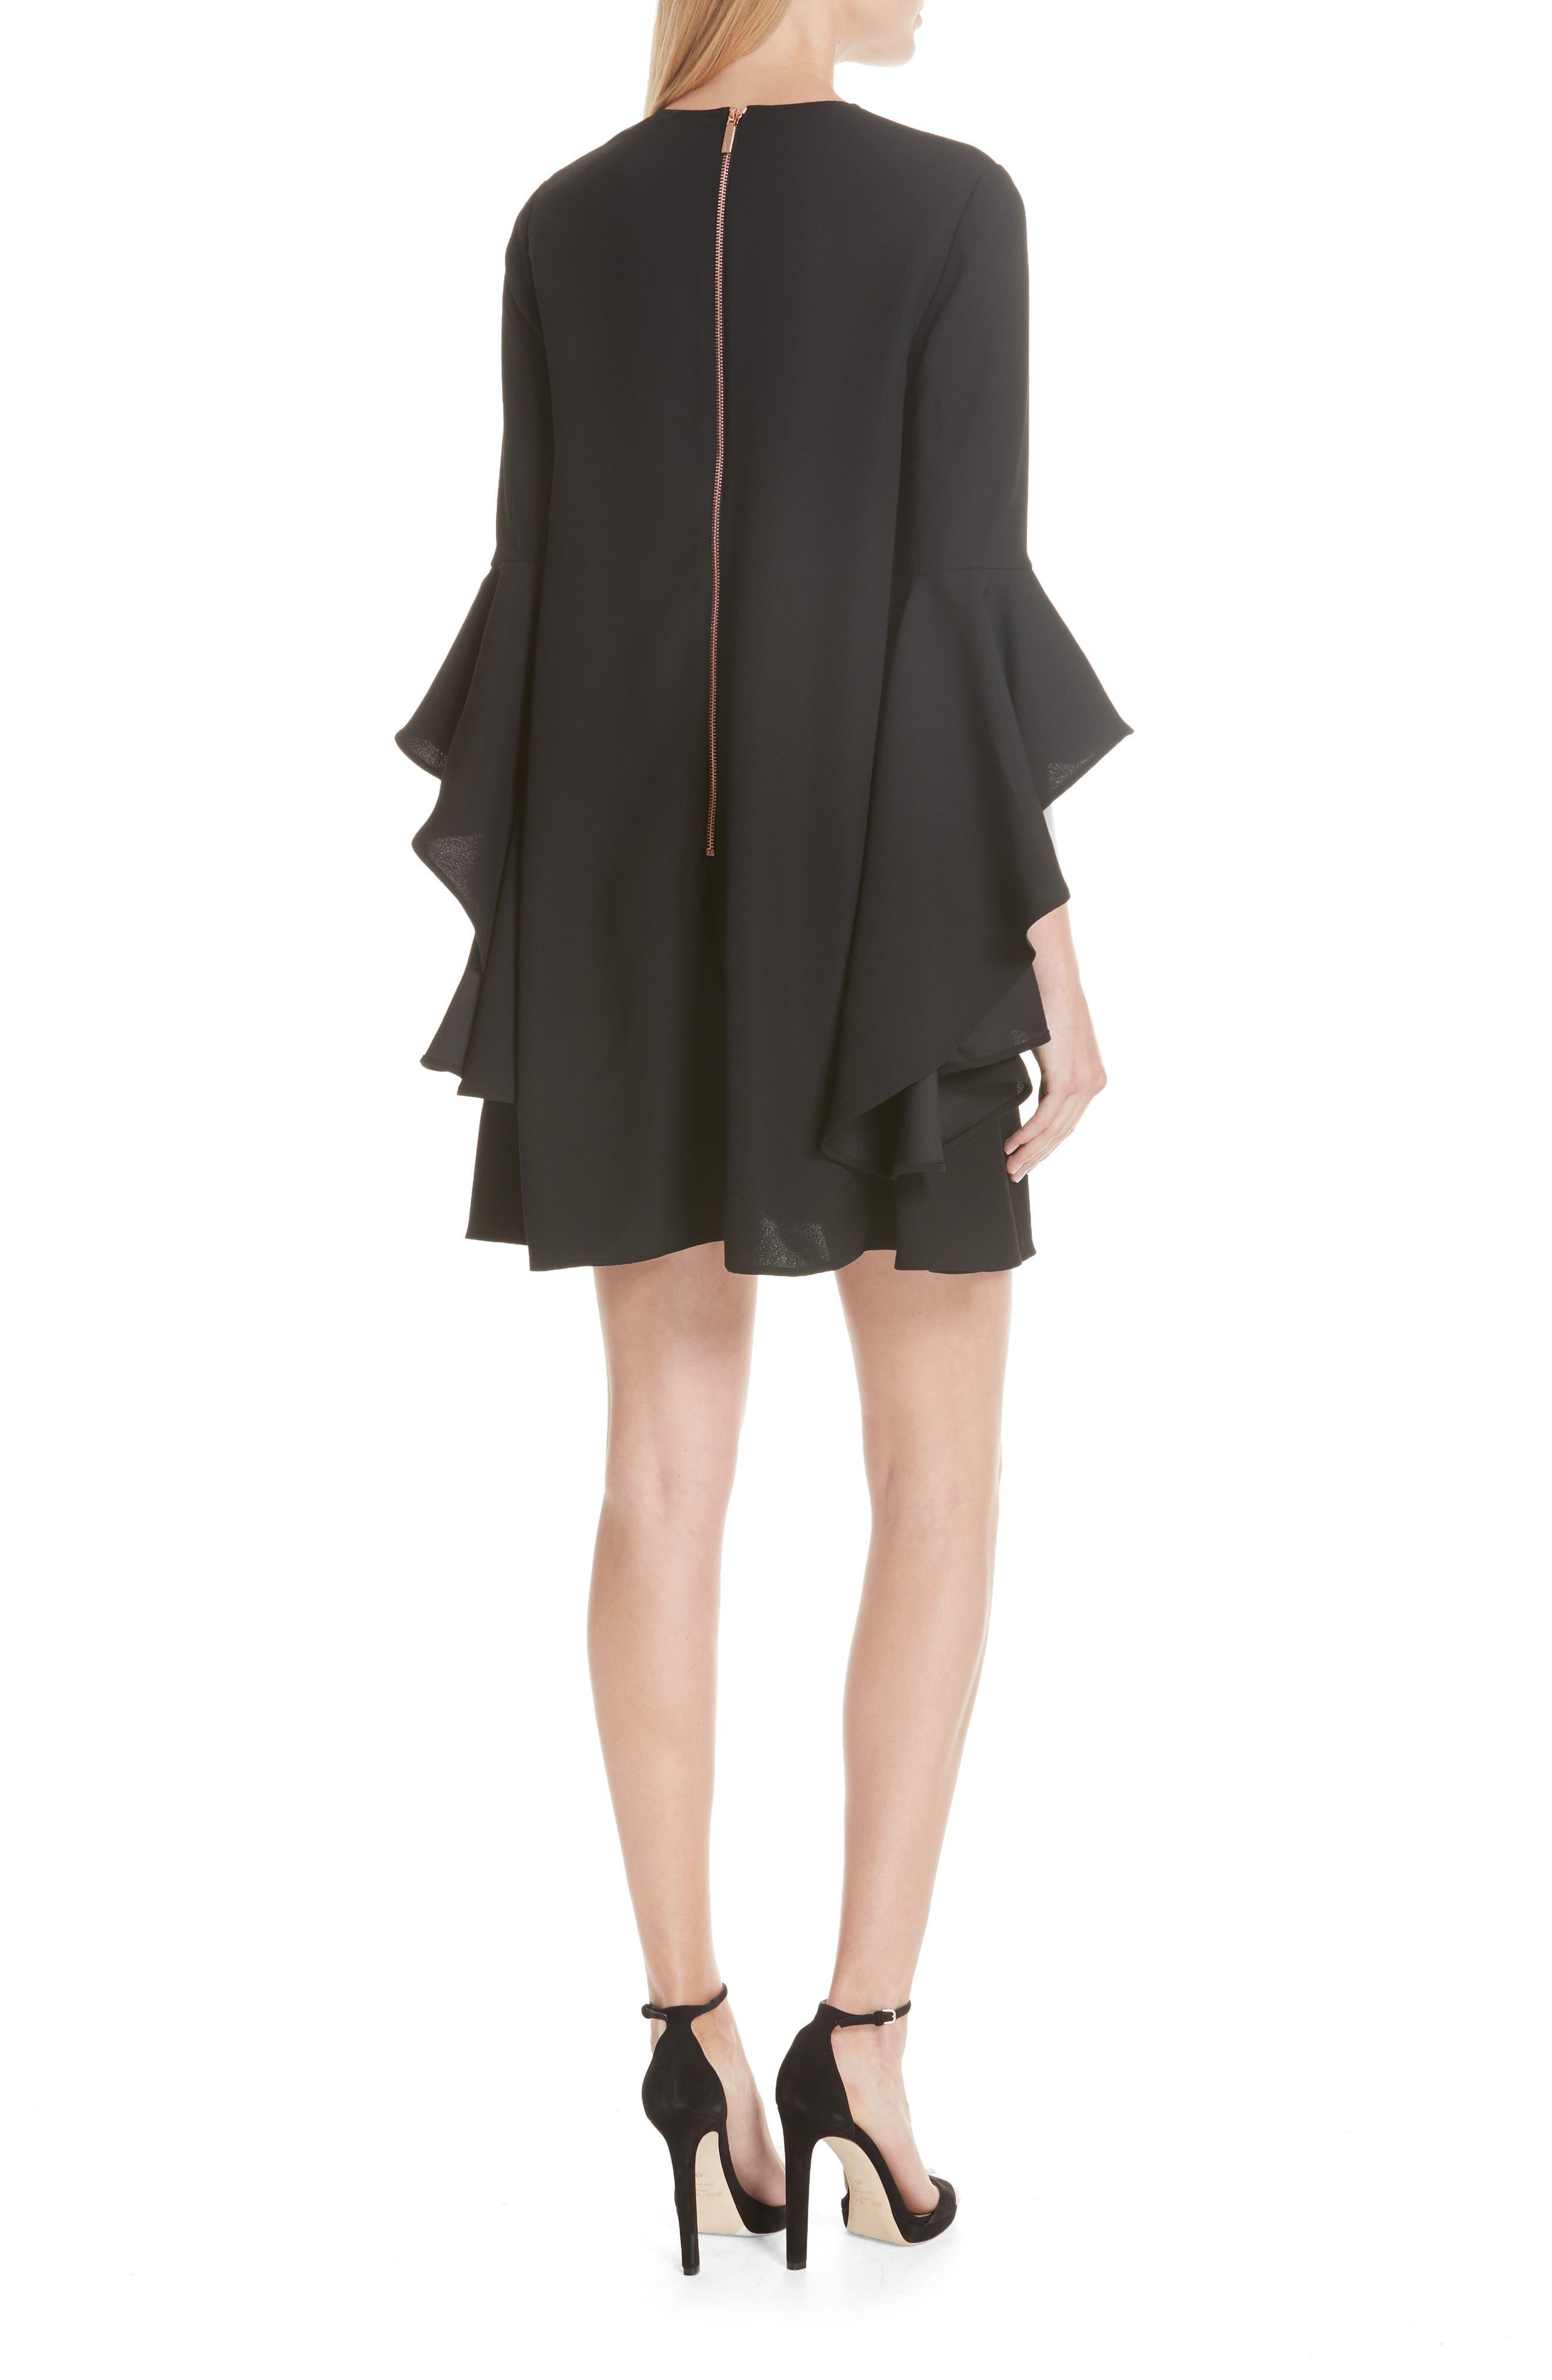 TED BAKER LONDON,                             Ashley Waterfall Sleeve A-Line Dress,                             Alternate thumbnail 2, color,                             001